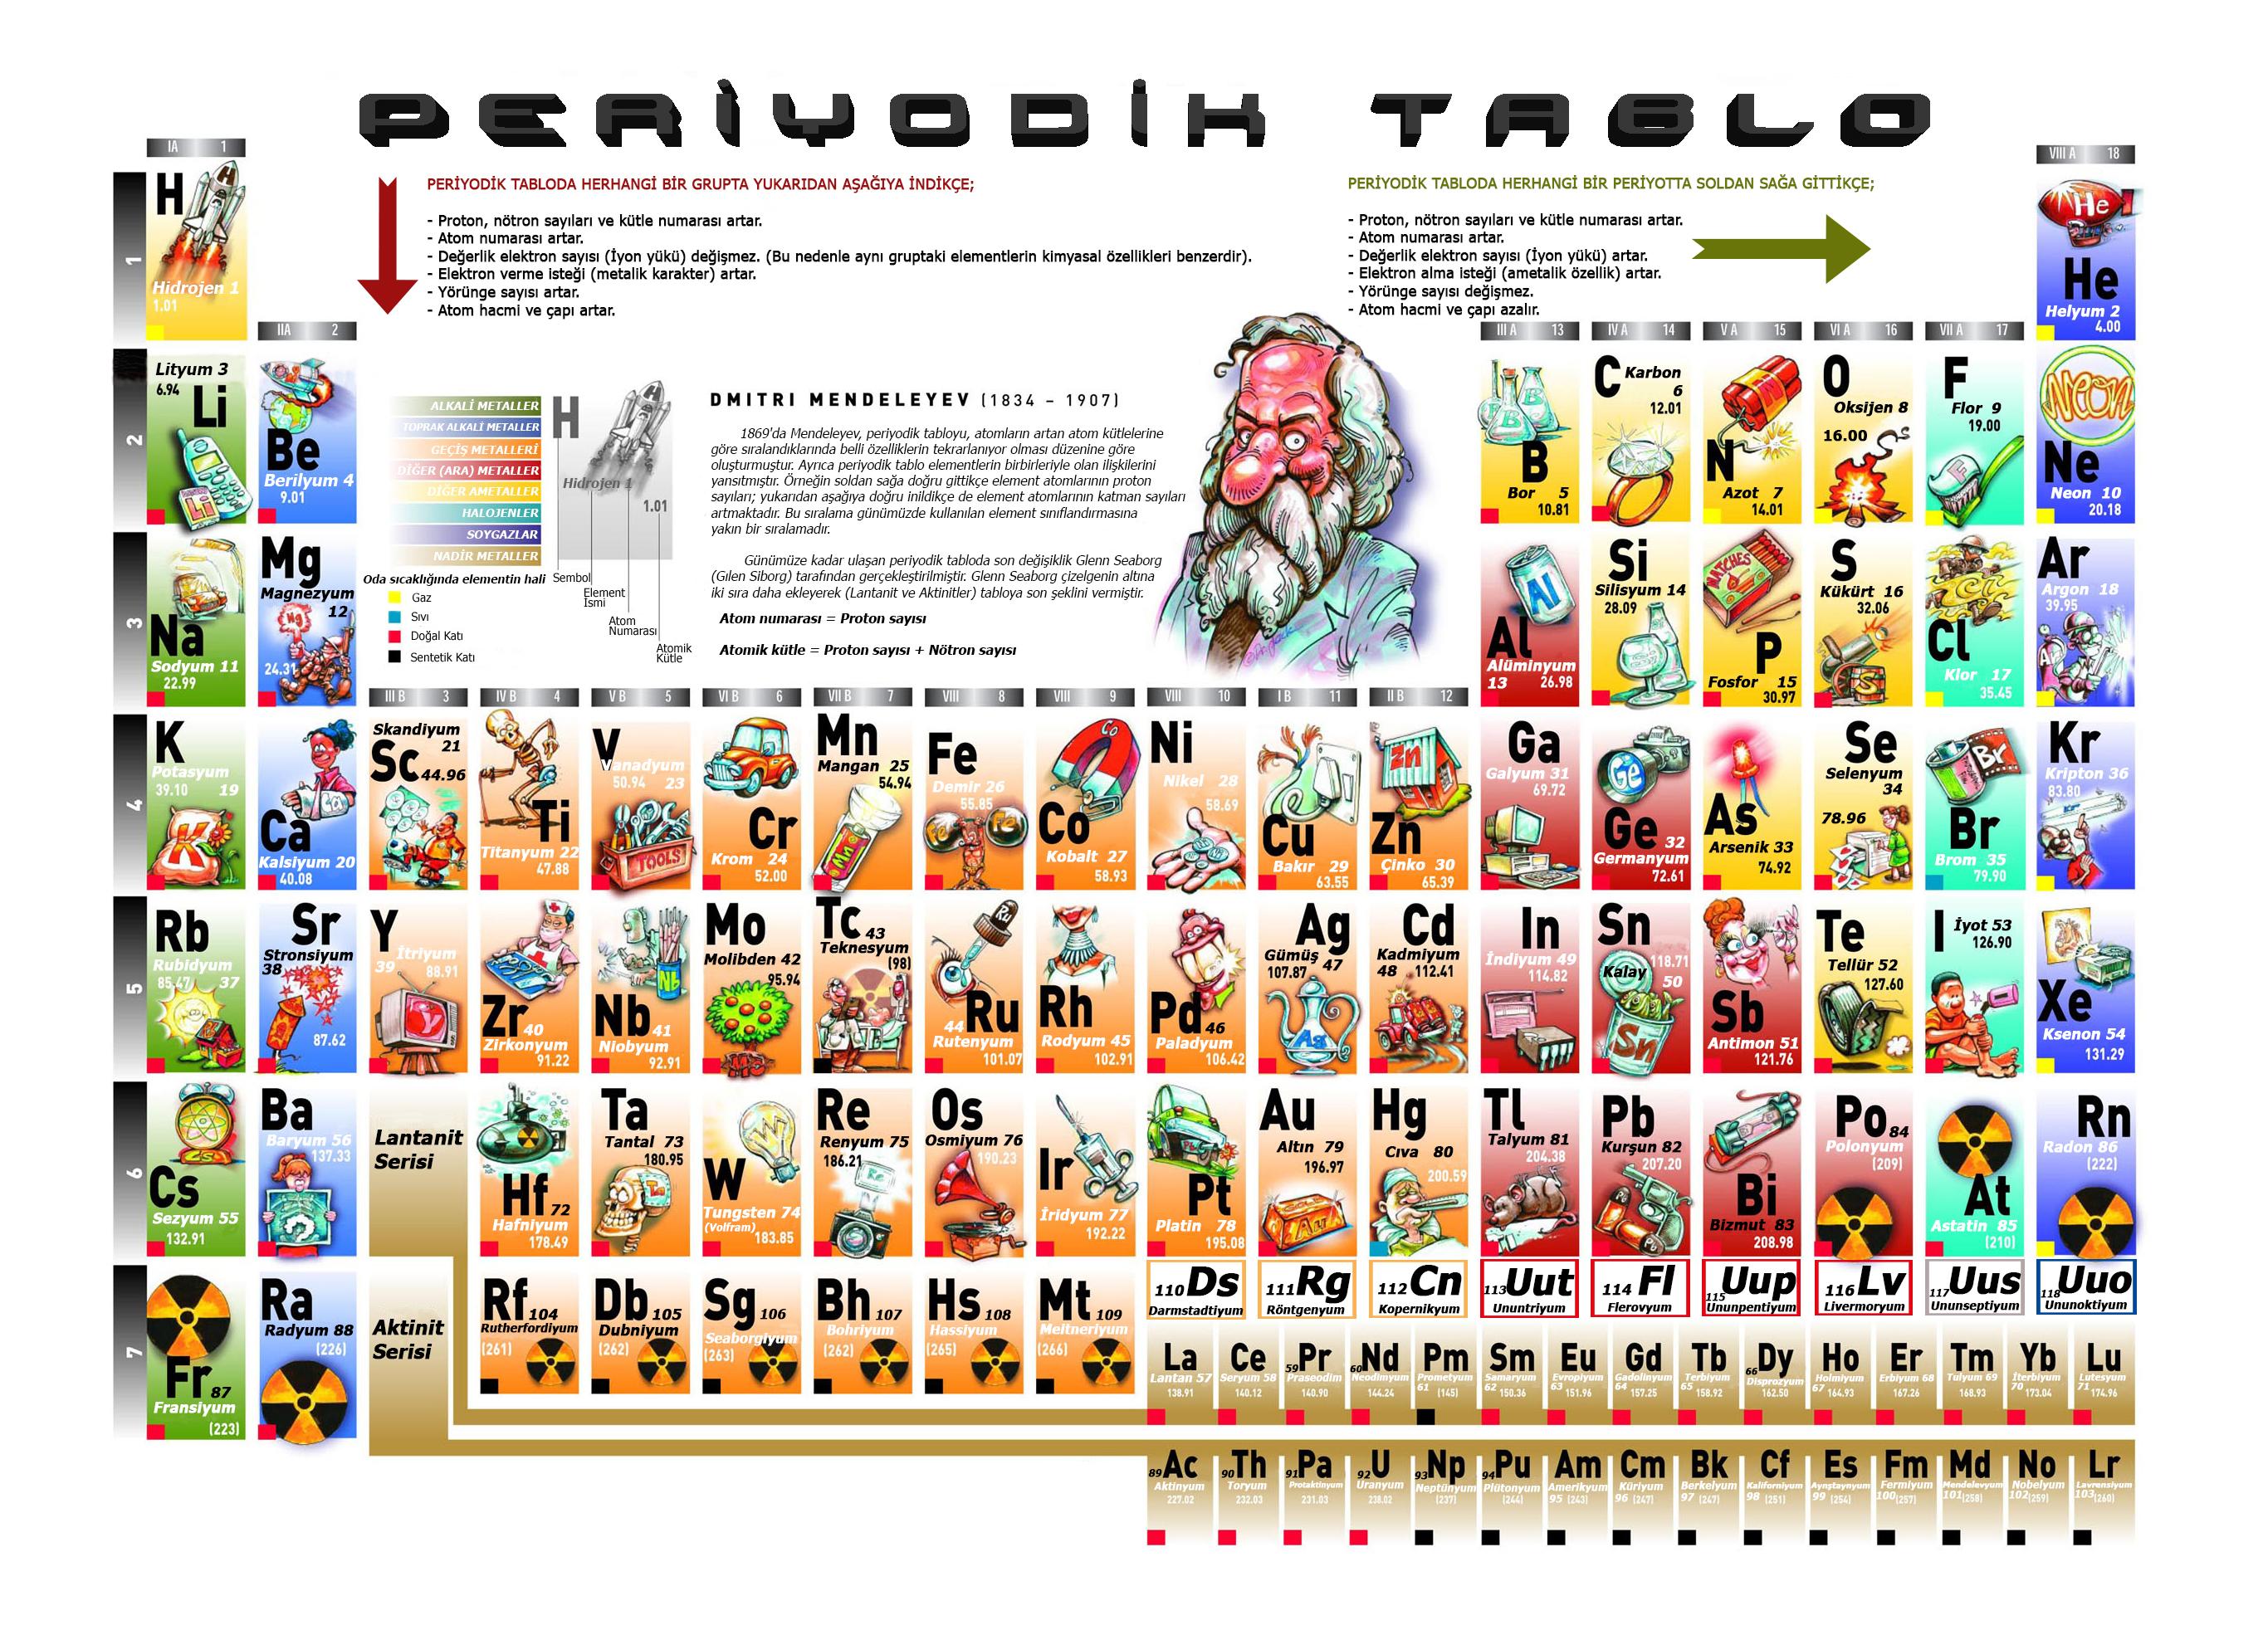 Periyodik tablo turkish periodic tables of the elements michael periyodik tablo turkish periodic tables of the elements michael canov from czech republic gamestrikefo Gallery